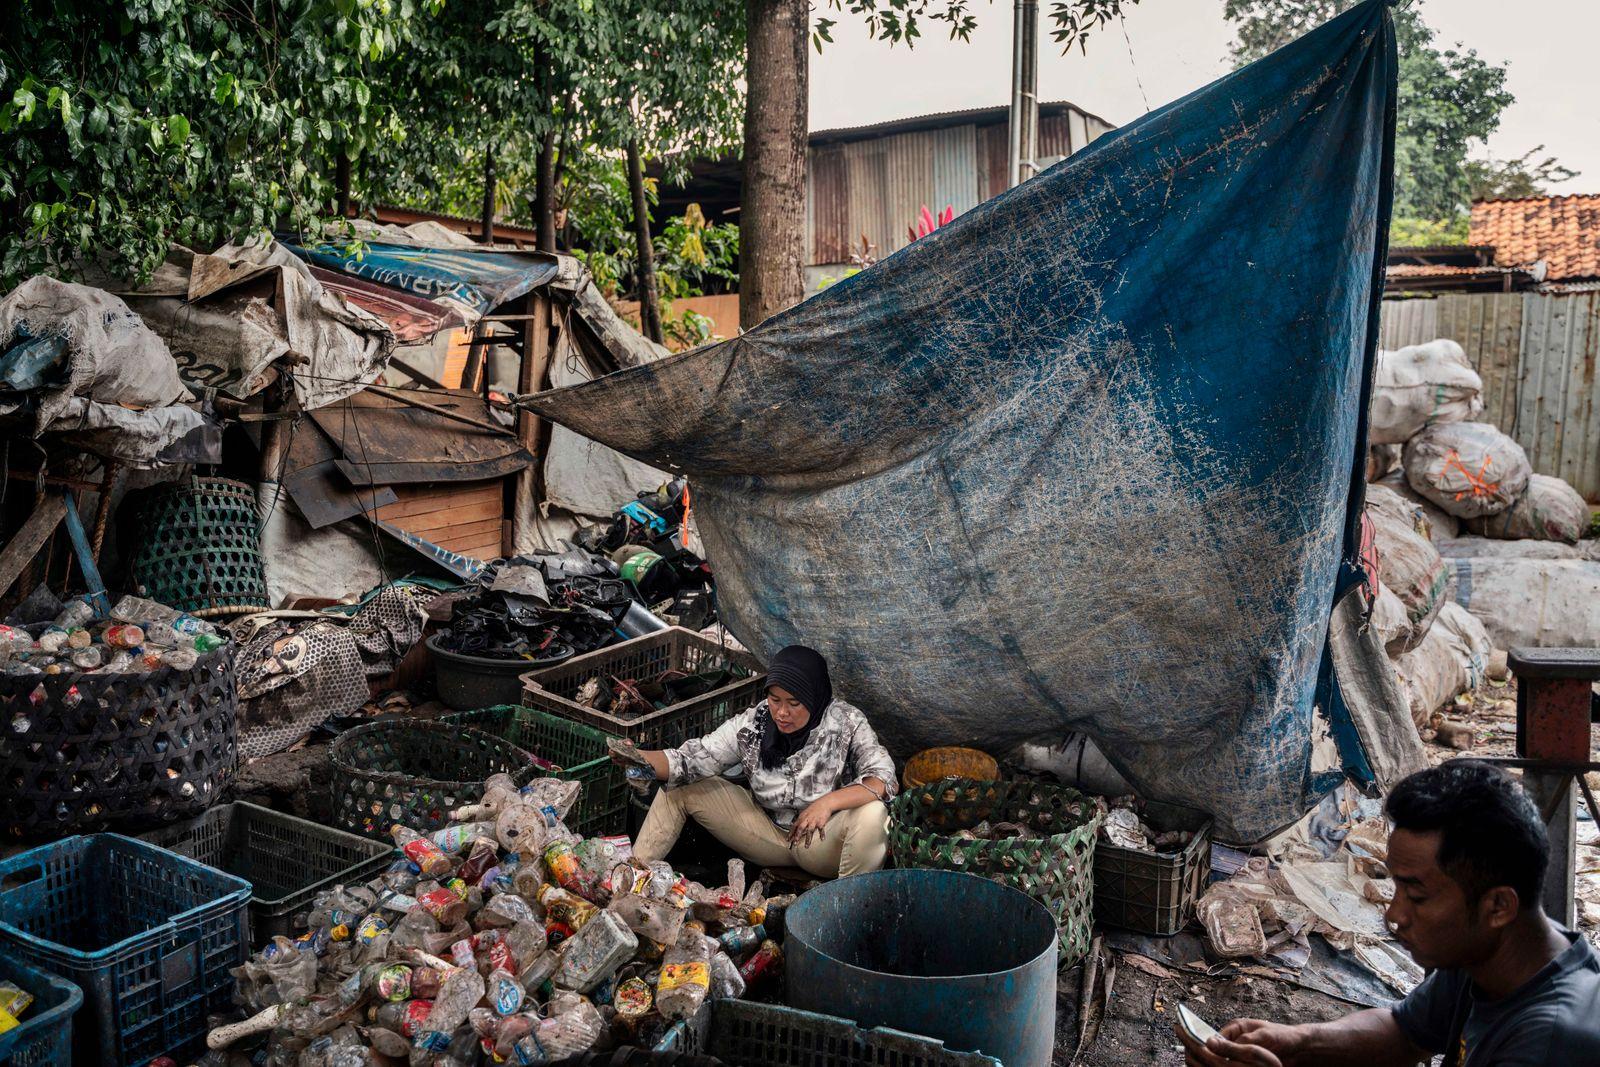 Indonesia Trash Pickers